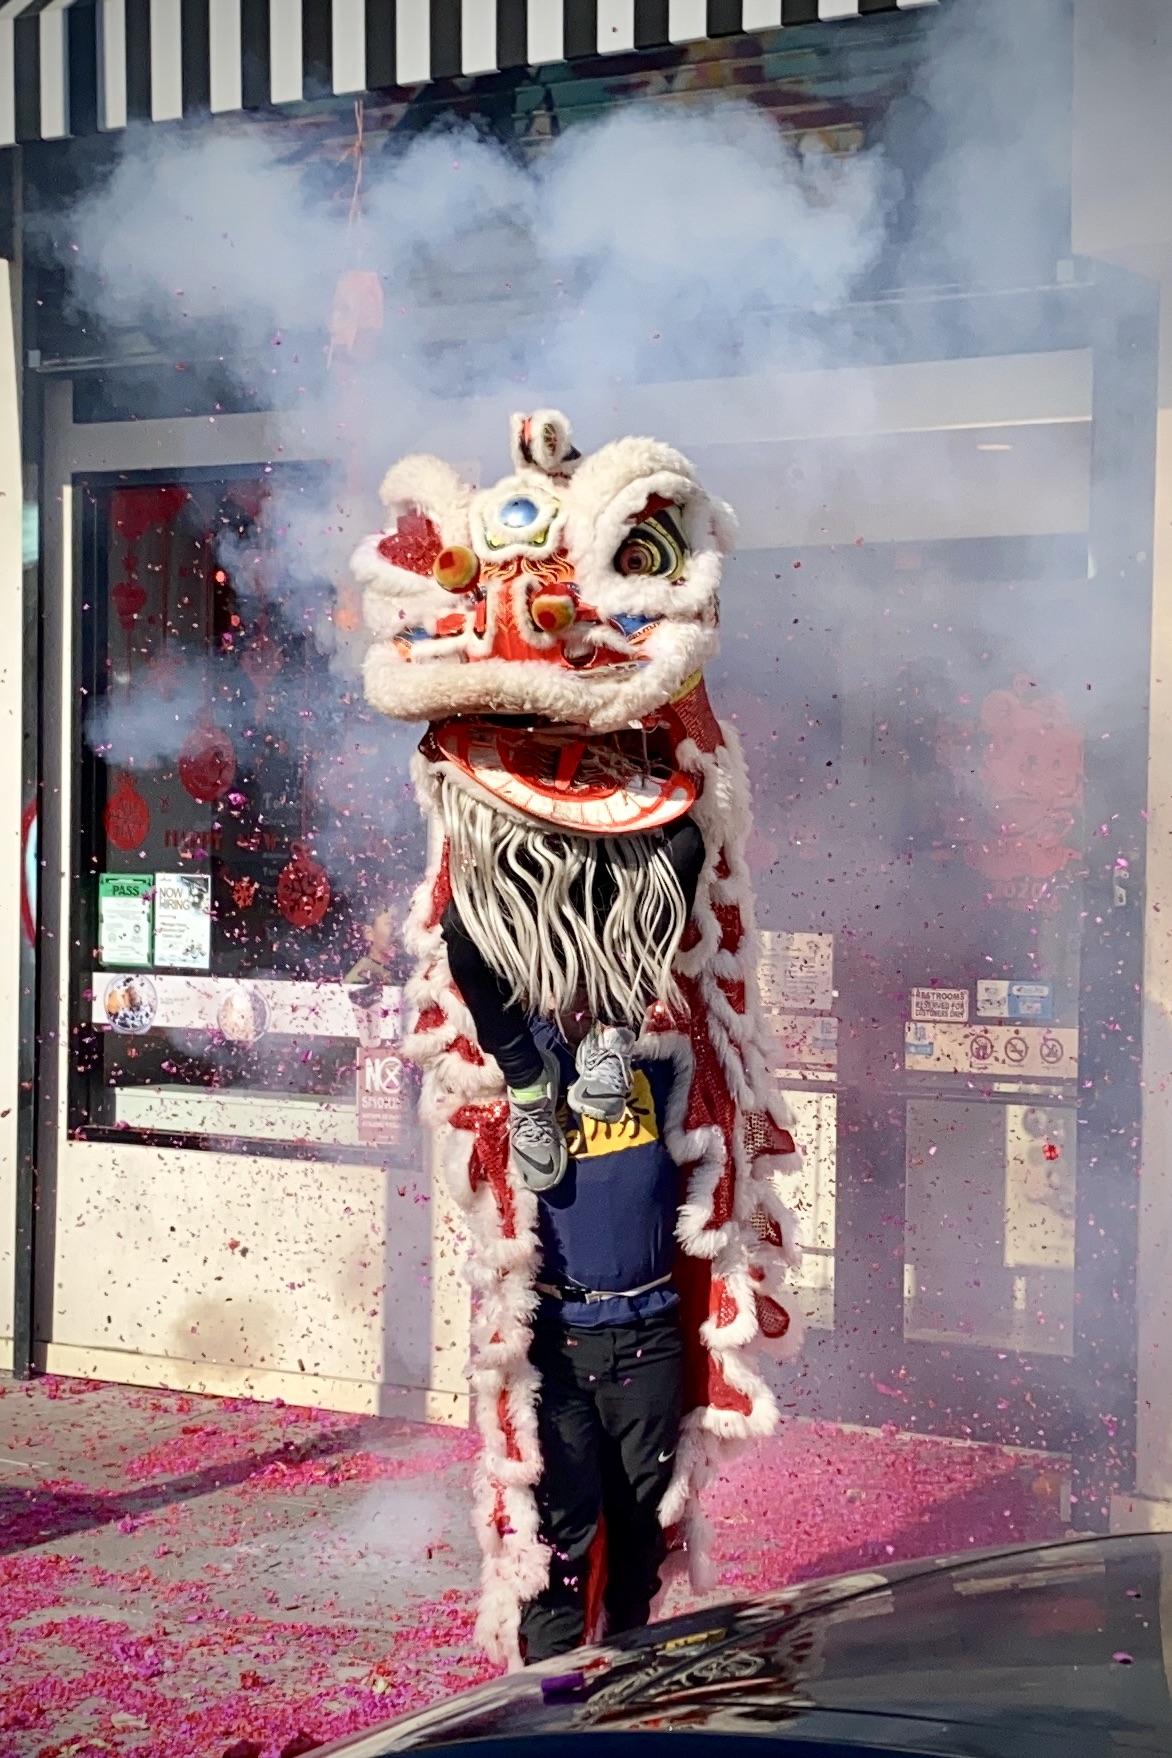 Lion Dancers perform under exploding firecrackers